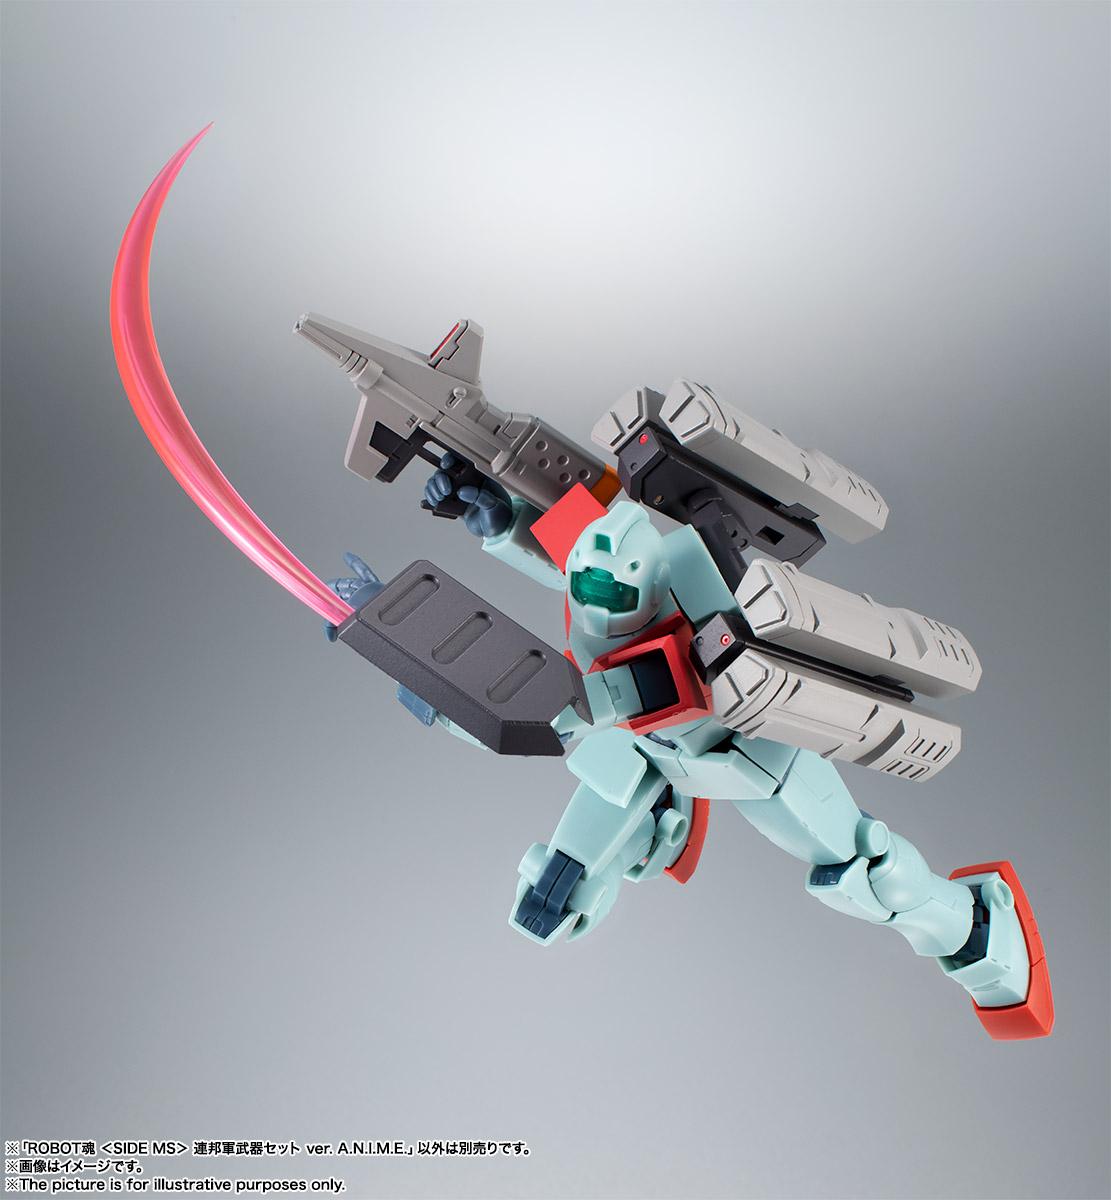 ROBOT魂〈SIDE MS〉『連邦軍武器セット ver. A.N.I.M.E.』ガンダム 完成品フィギュア-006